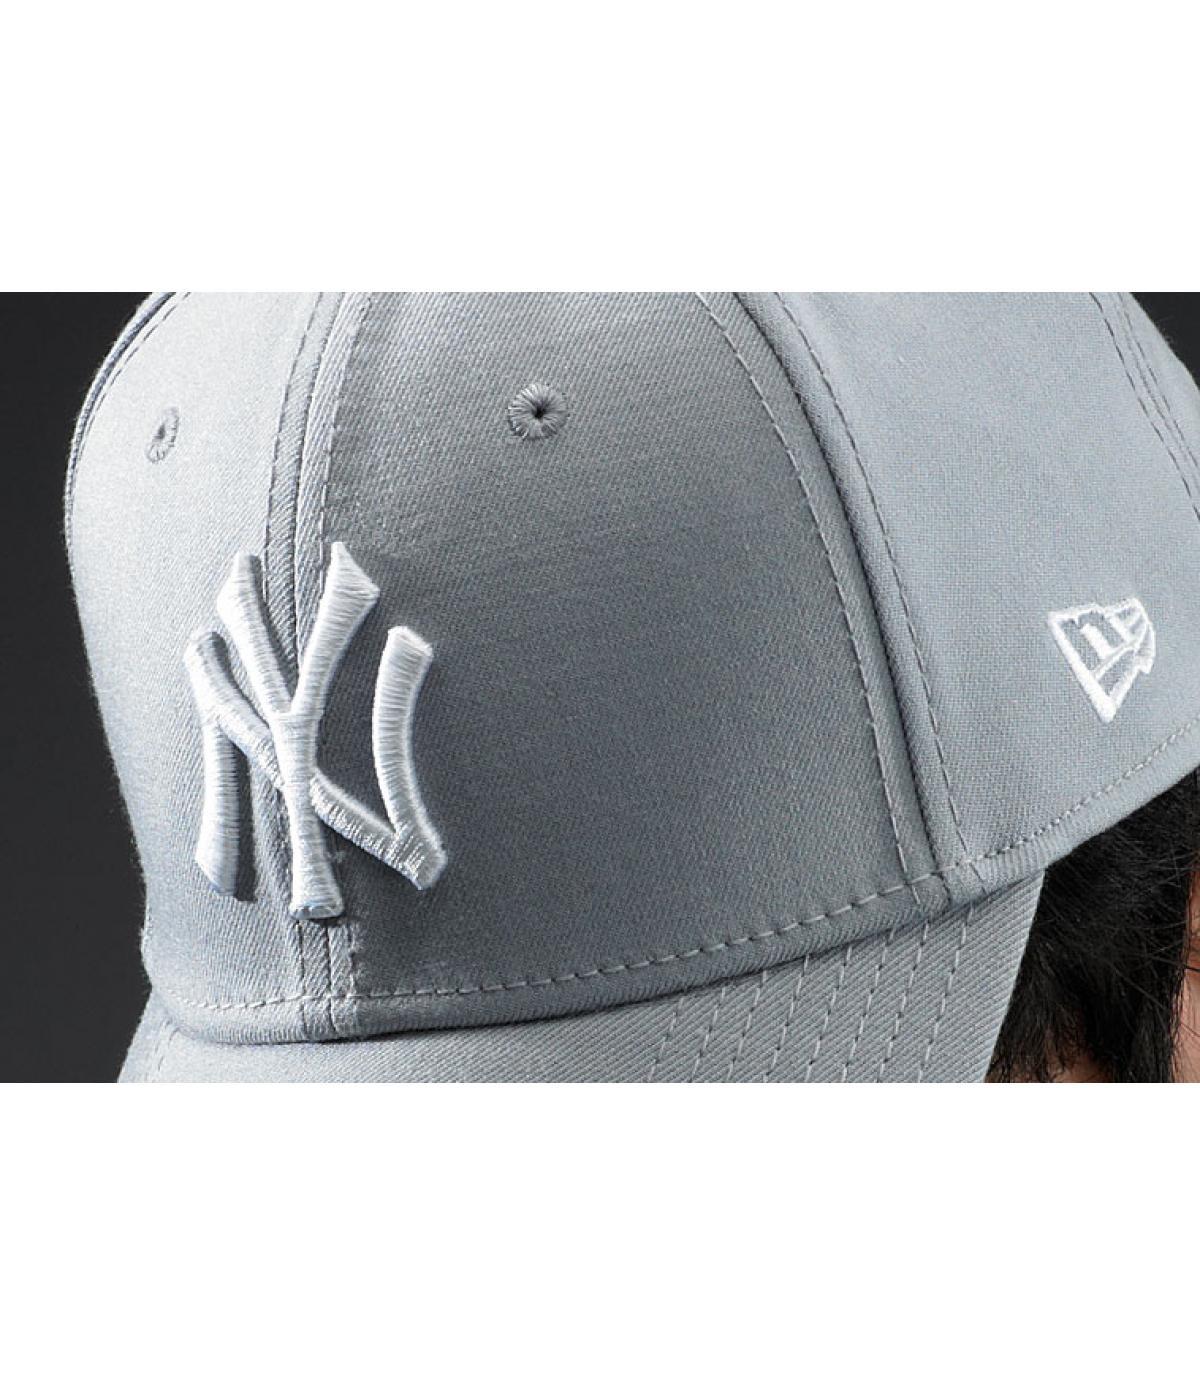 Dettagli League Ess NY 9forty grey white - image 3